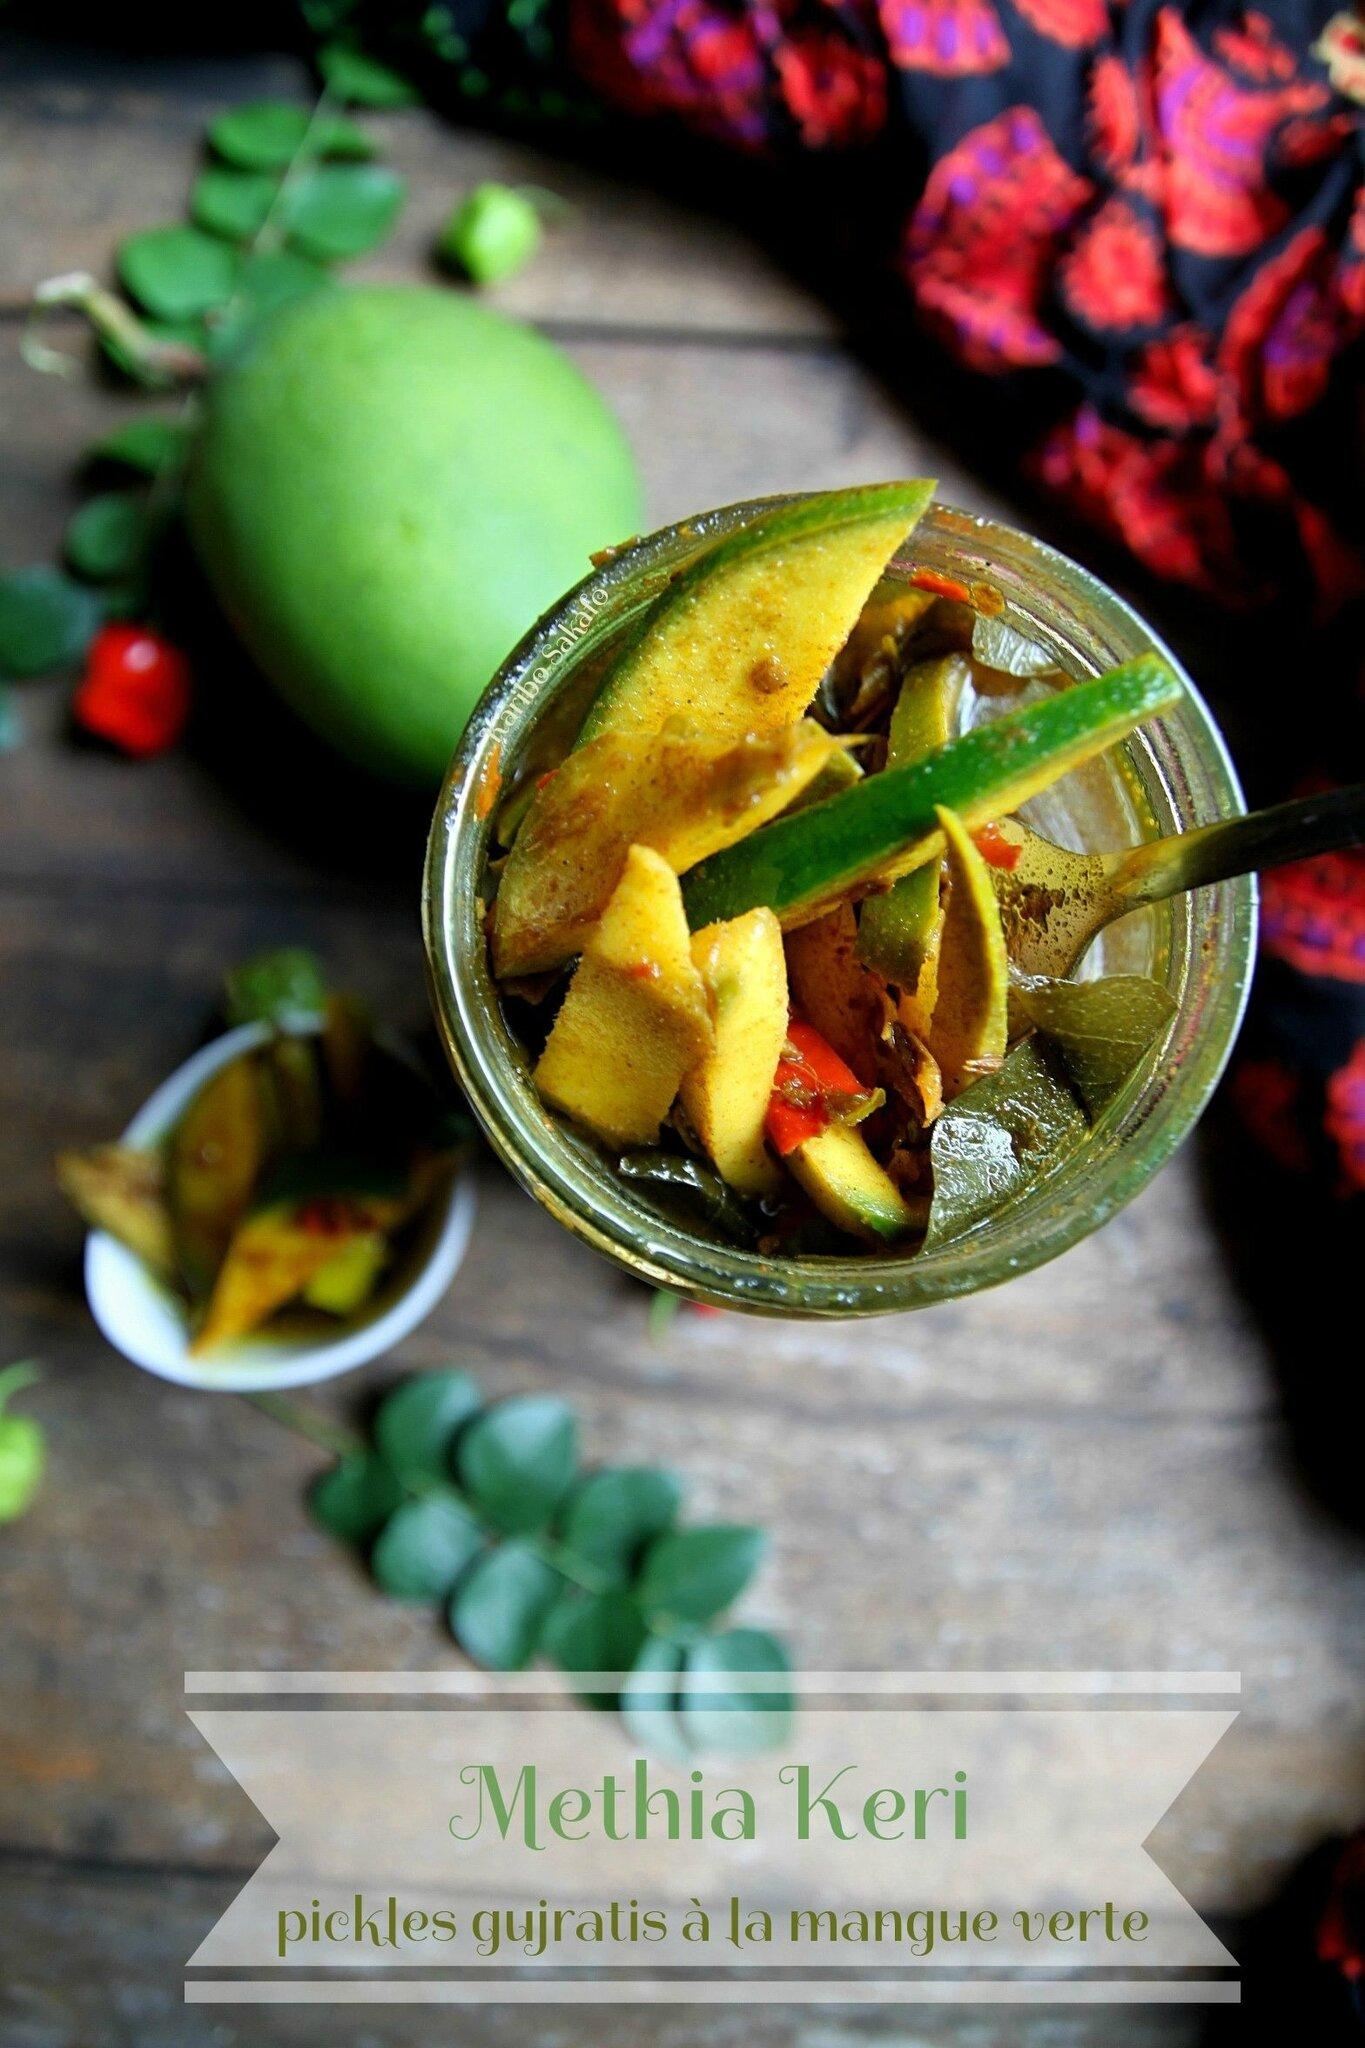 Methia keri: pickles gujratis à la mangue verte